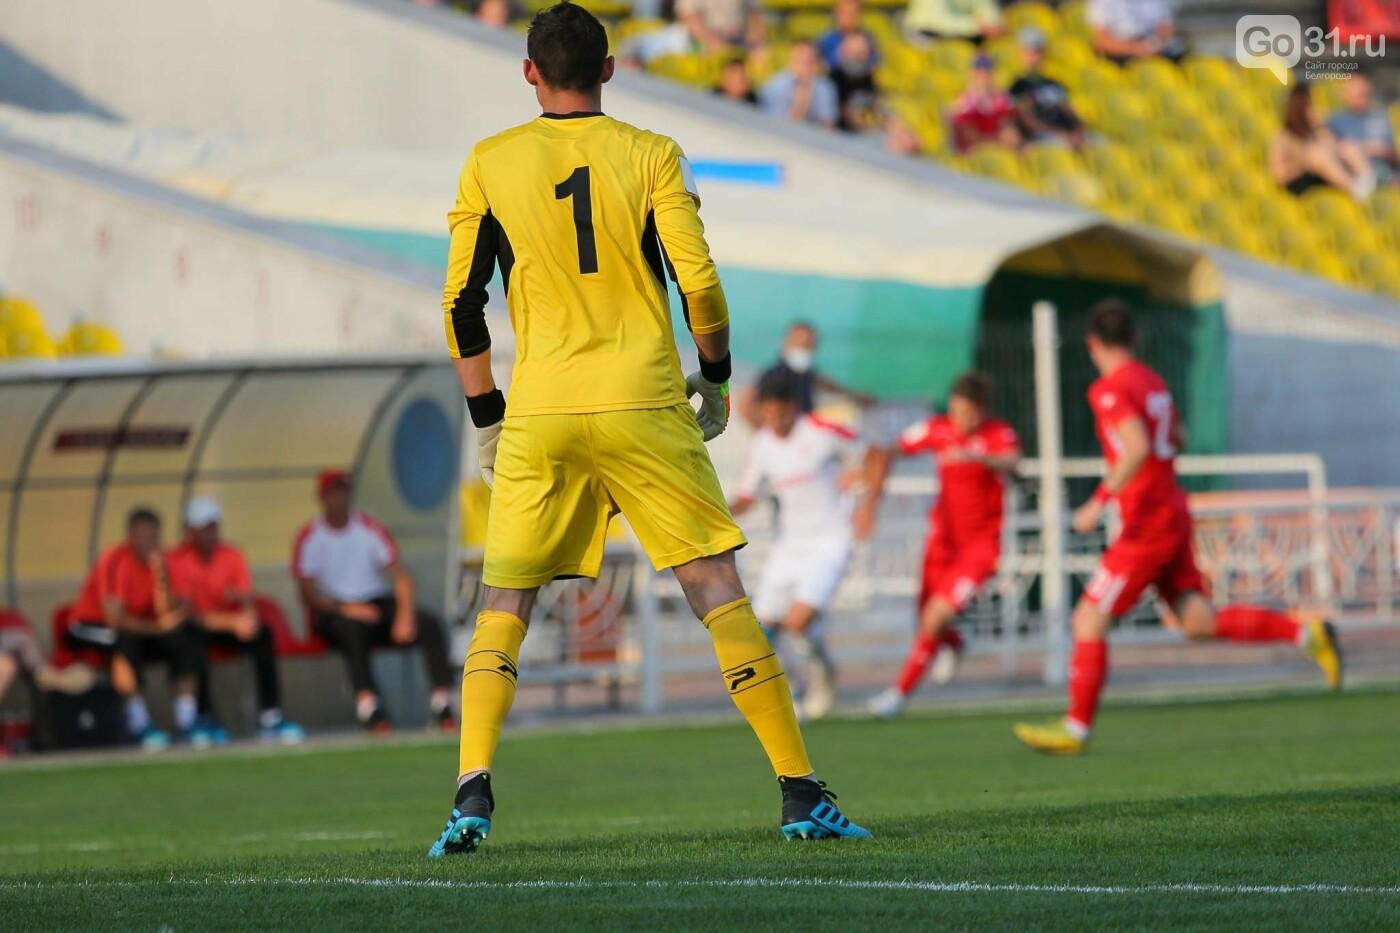 «Салют Белгород»: третья победа подряд, фото-9, Фото: Антон Вергун